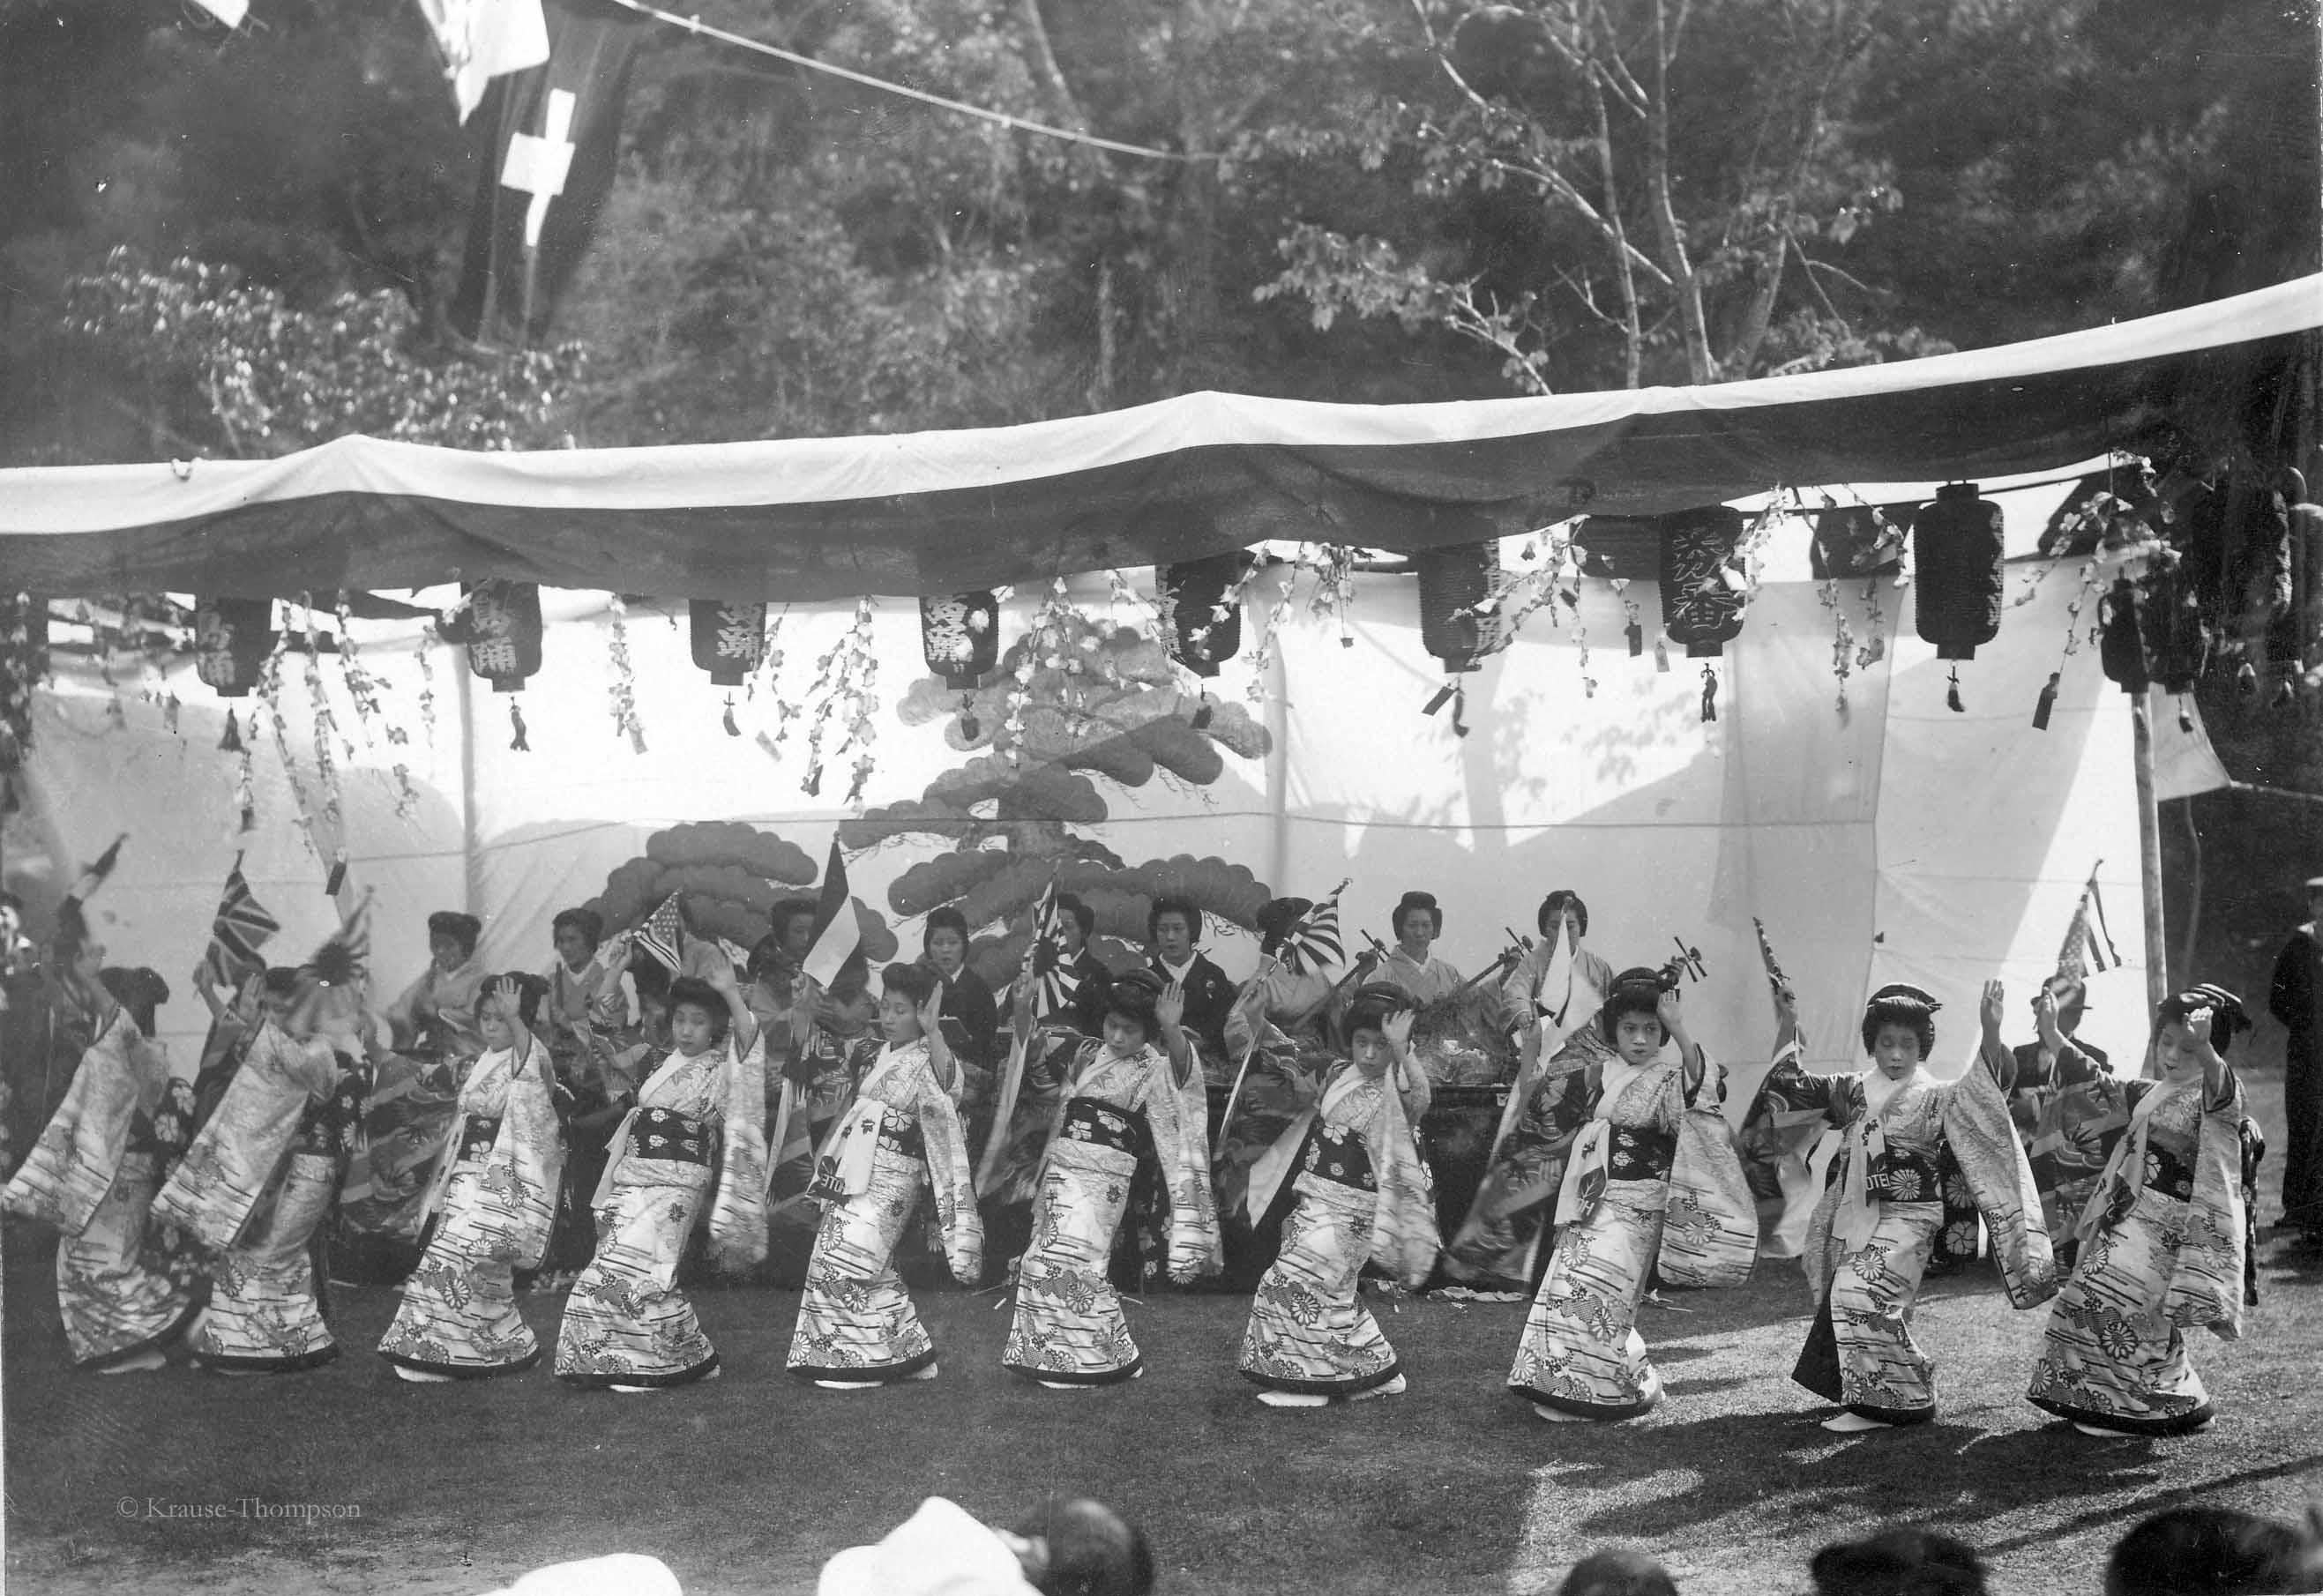 Geisha dance in Japan